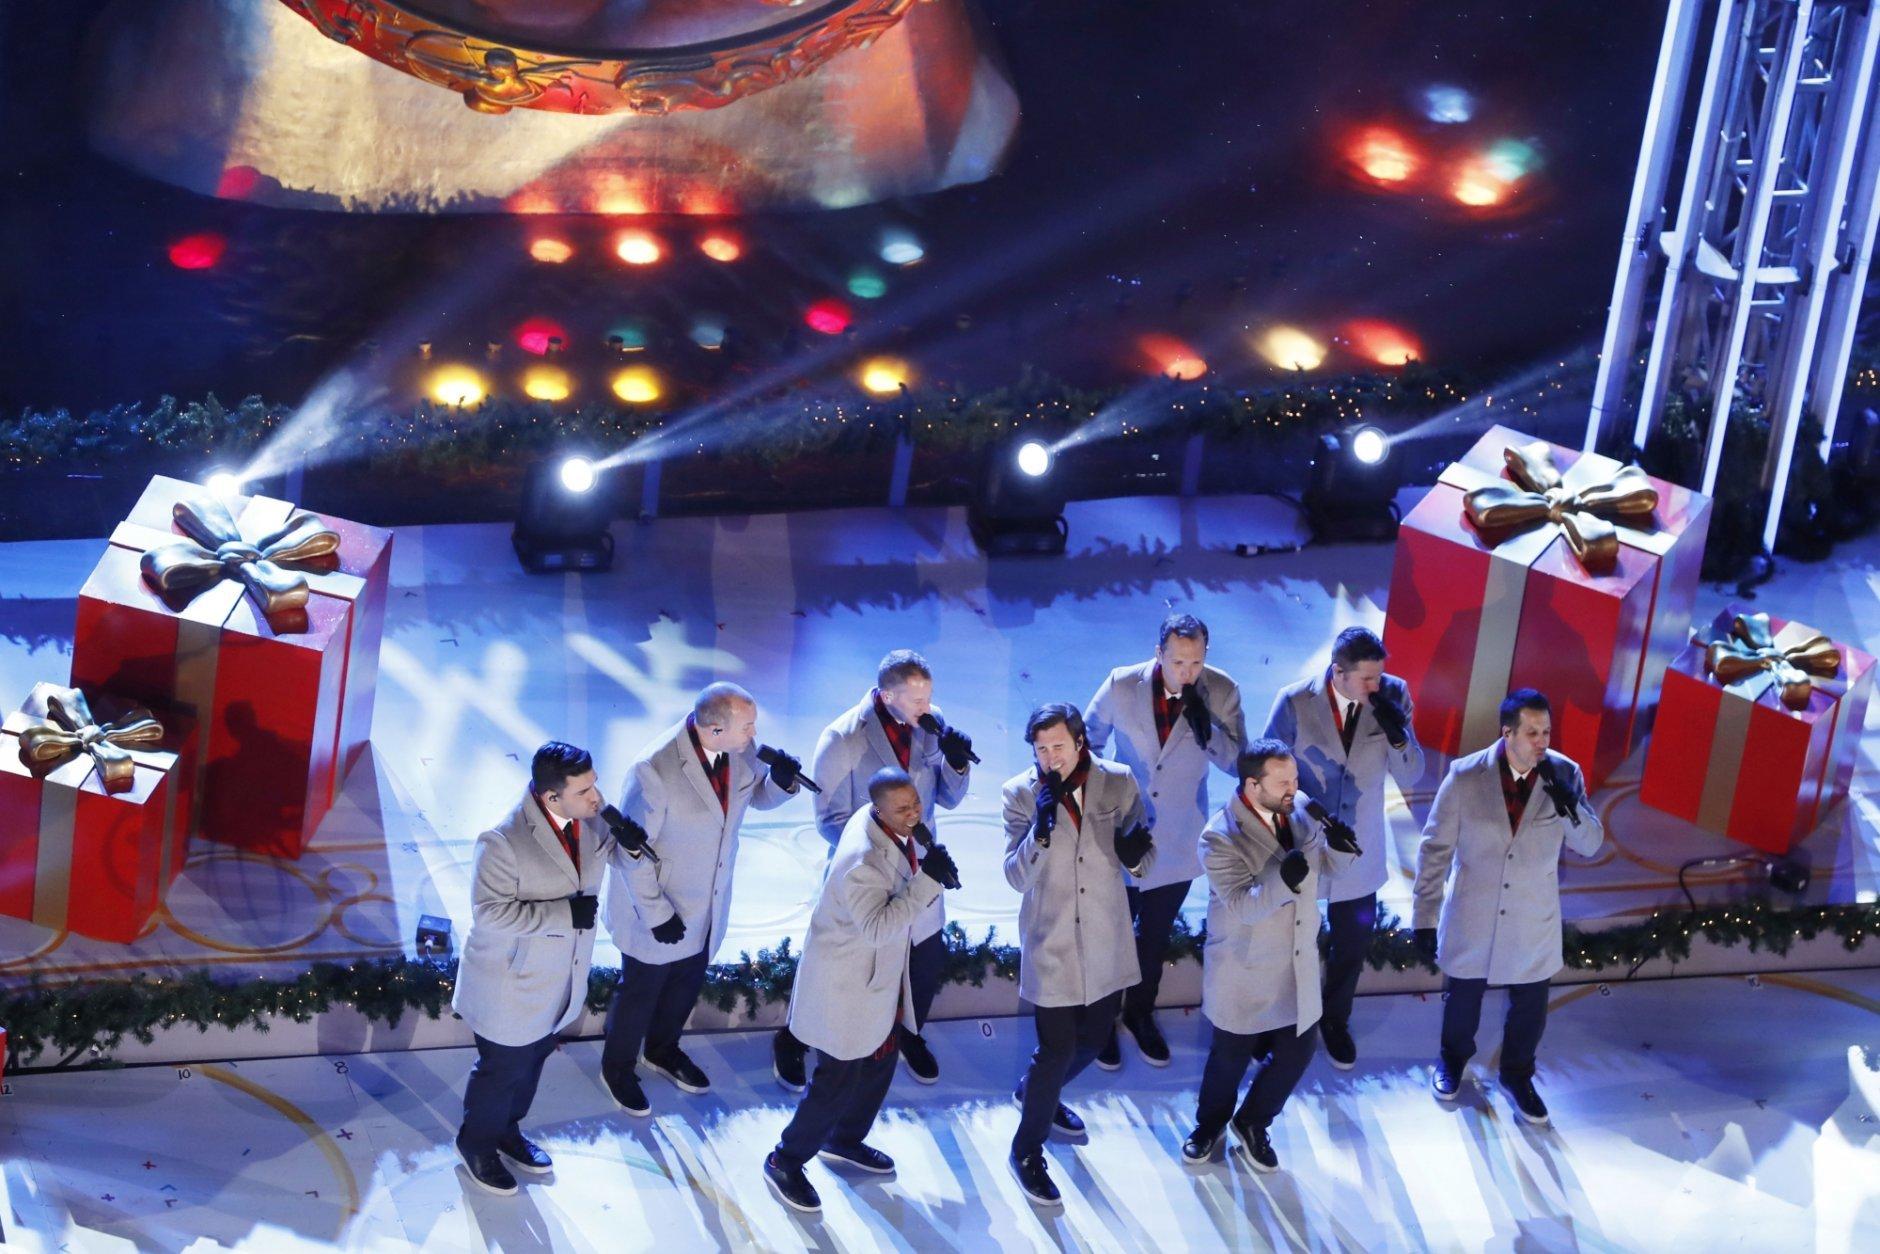 'Tis the season: Rockefeller Center Christmas tree lights up | WTOP